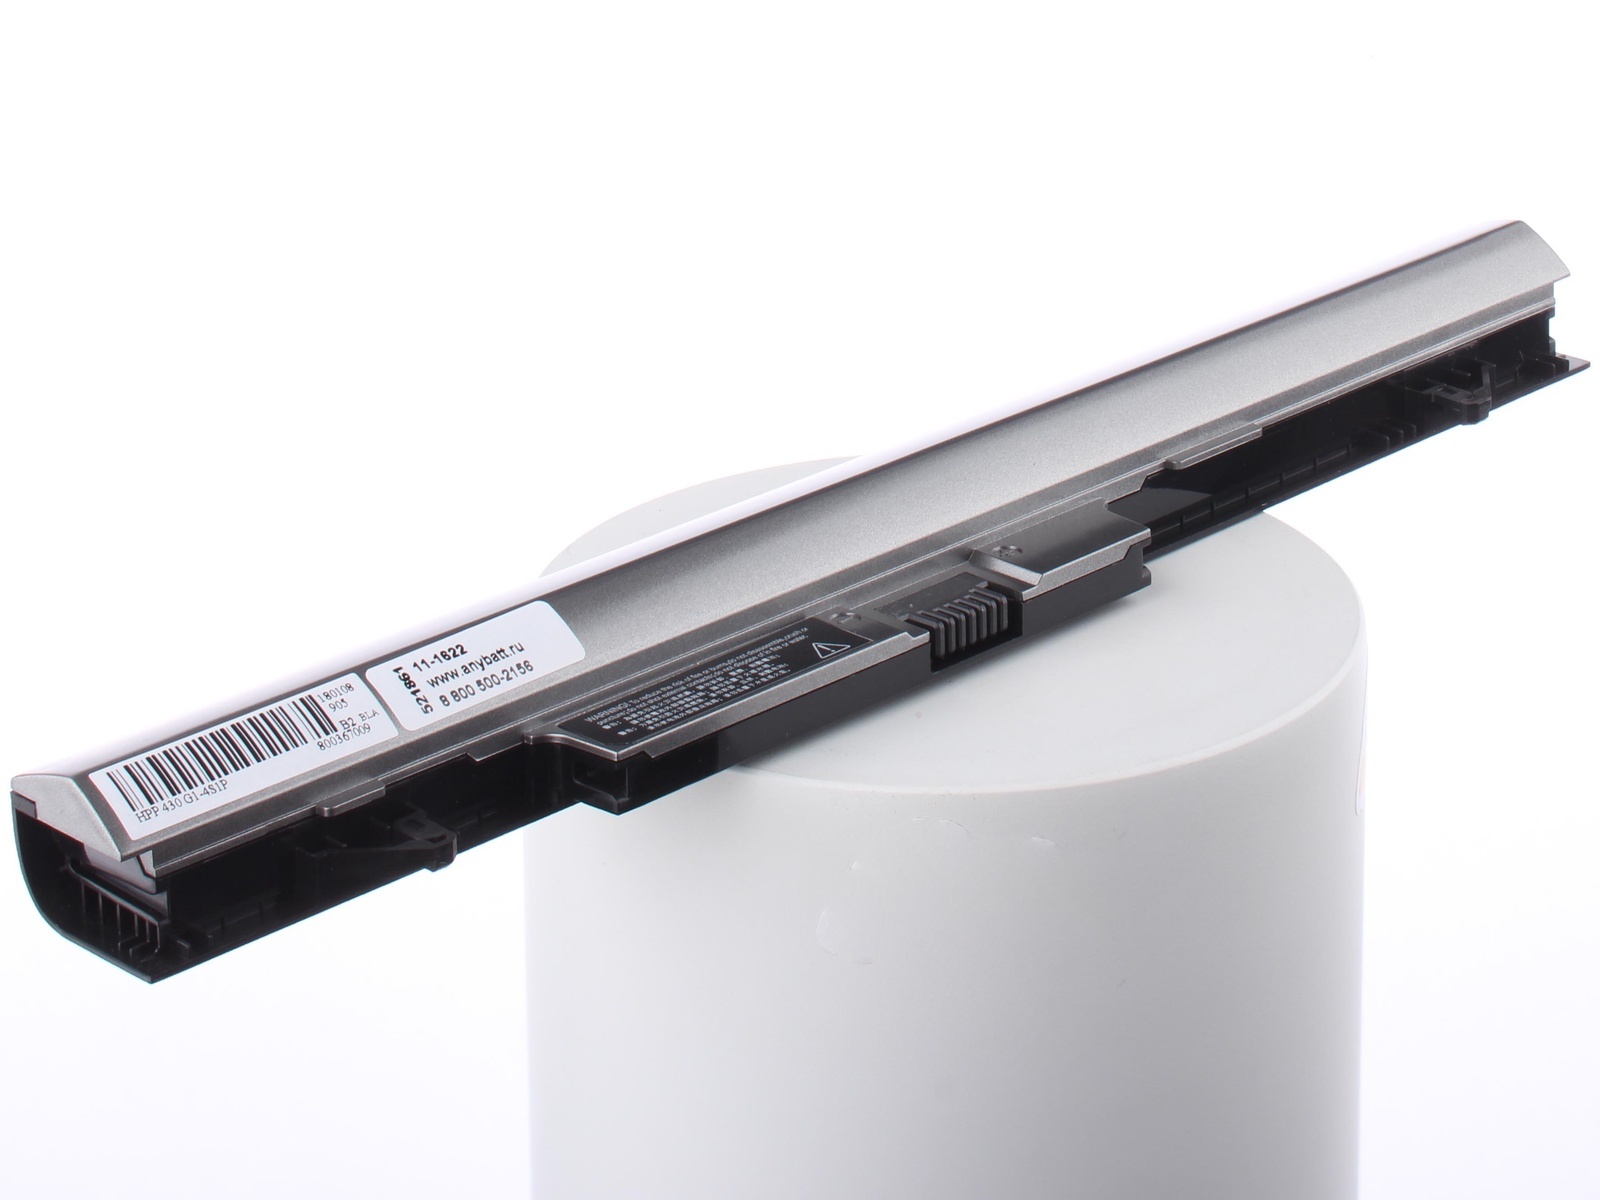 Аккумуляторная батарея AnyBatt 11-T1-1622 2200mAh для ноутбуков HP-Compaq ProBook 430 G2, ProBook 430 G1, ProBook 430 G2 (G6W08EA), ProBook 430 G2 (K9J92EA), ProBook 430 G2 (G6W00EA), ProBook 430 G2 (K9J85EA), ProBook 430 G2 (G6W10EA), футболка print bar g2 esports team